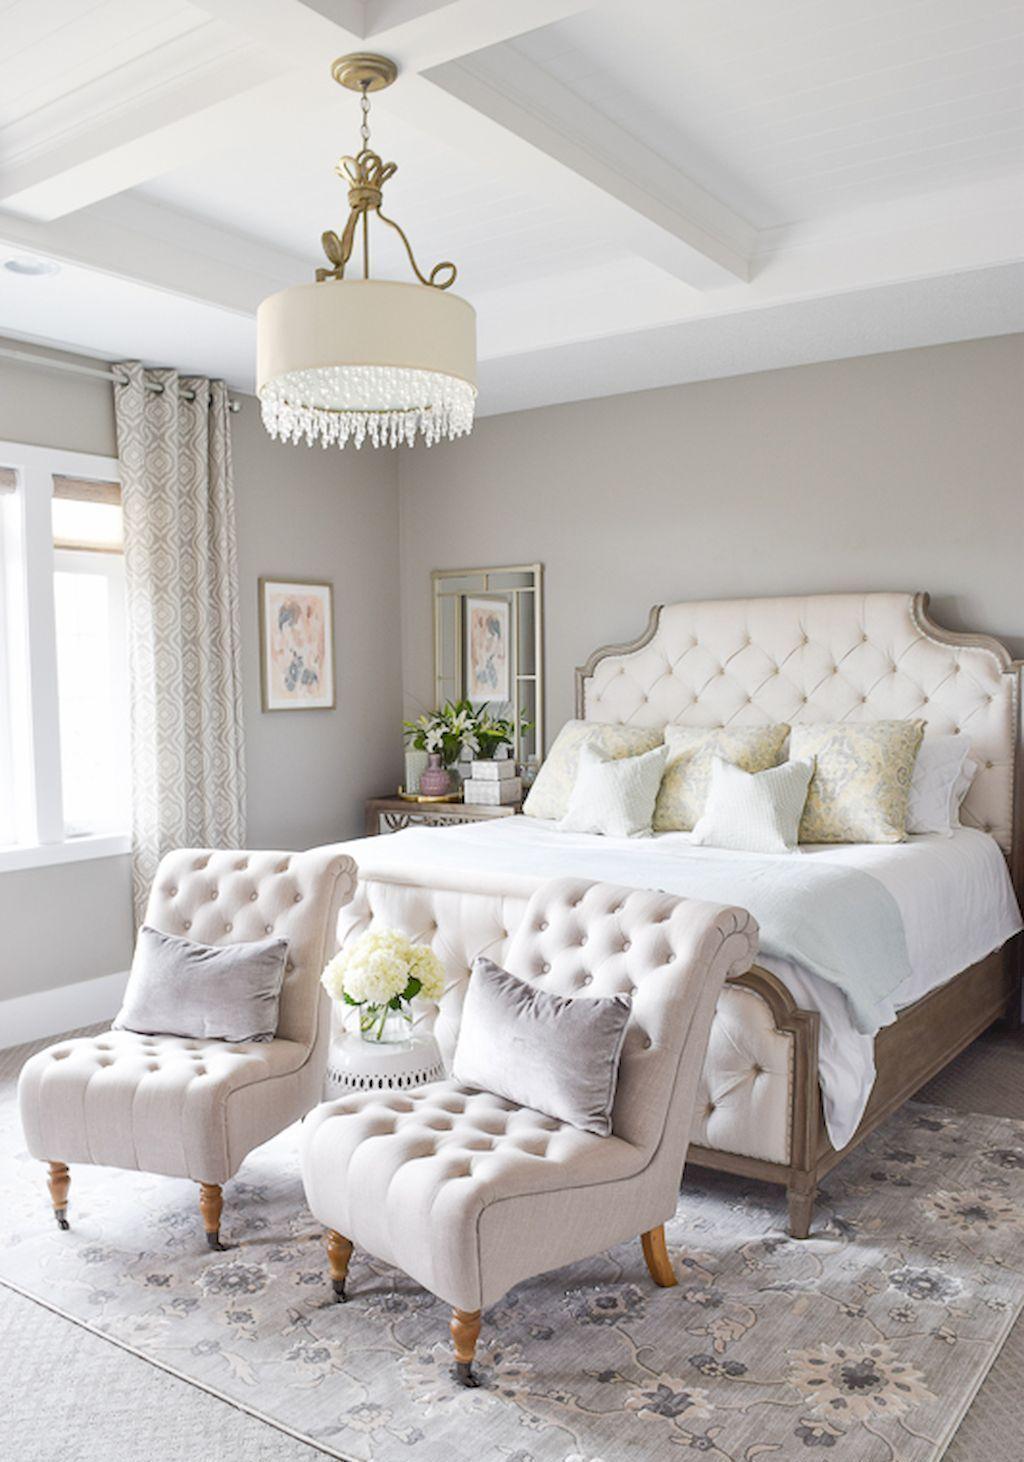 Cool inspiring master bedroom makeover ideas homeylife